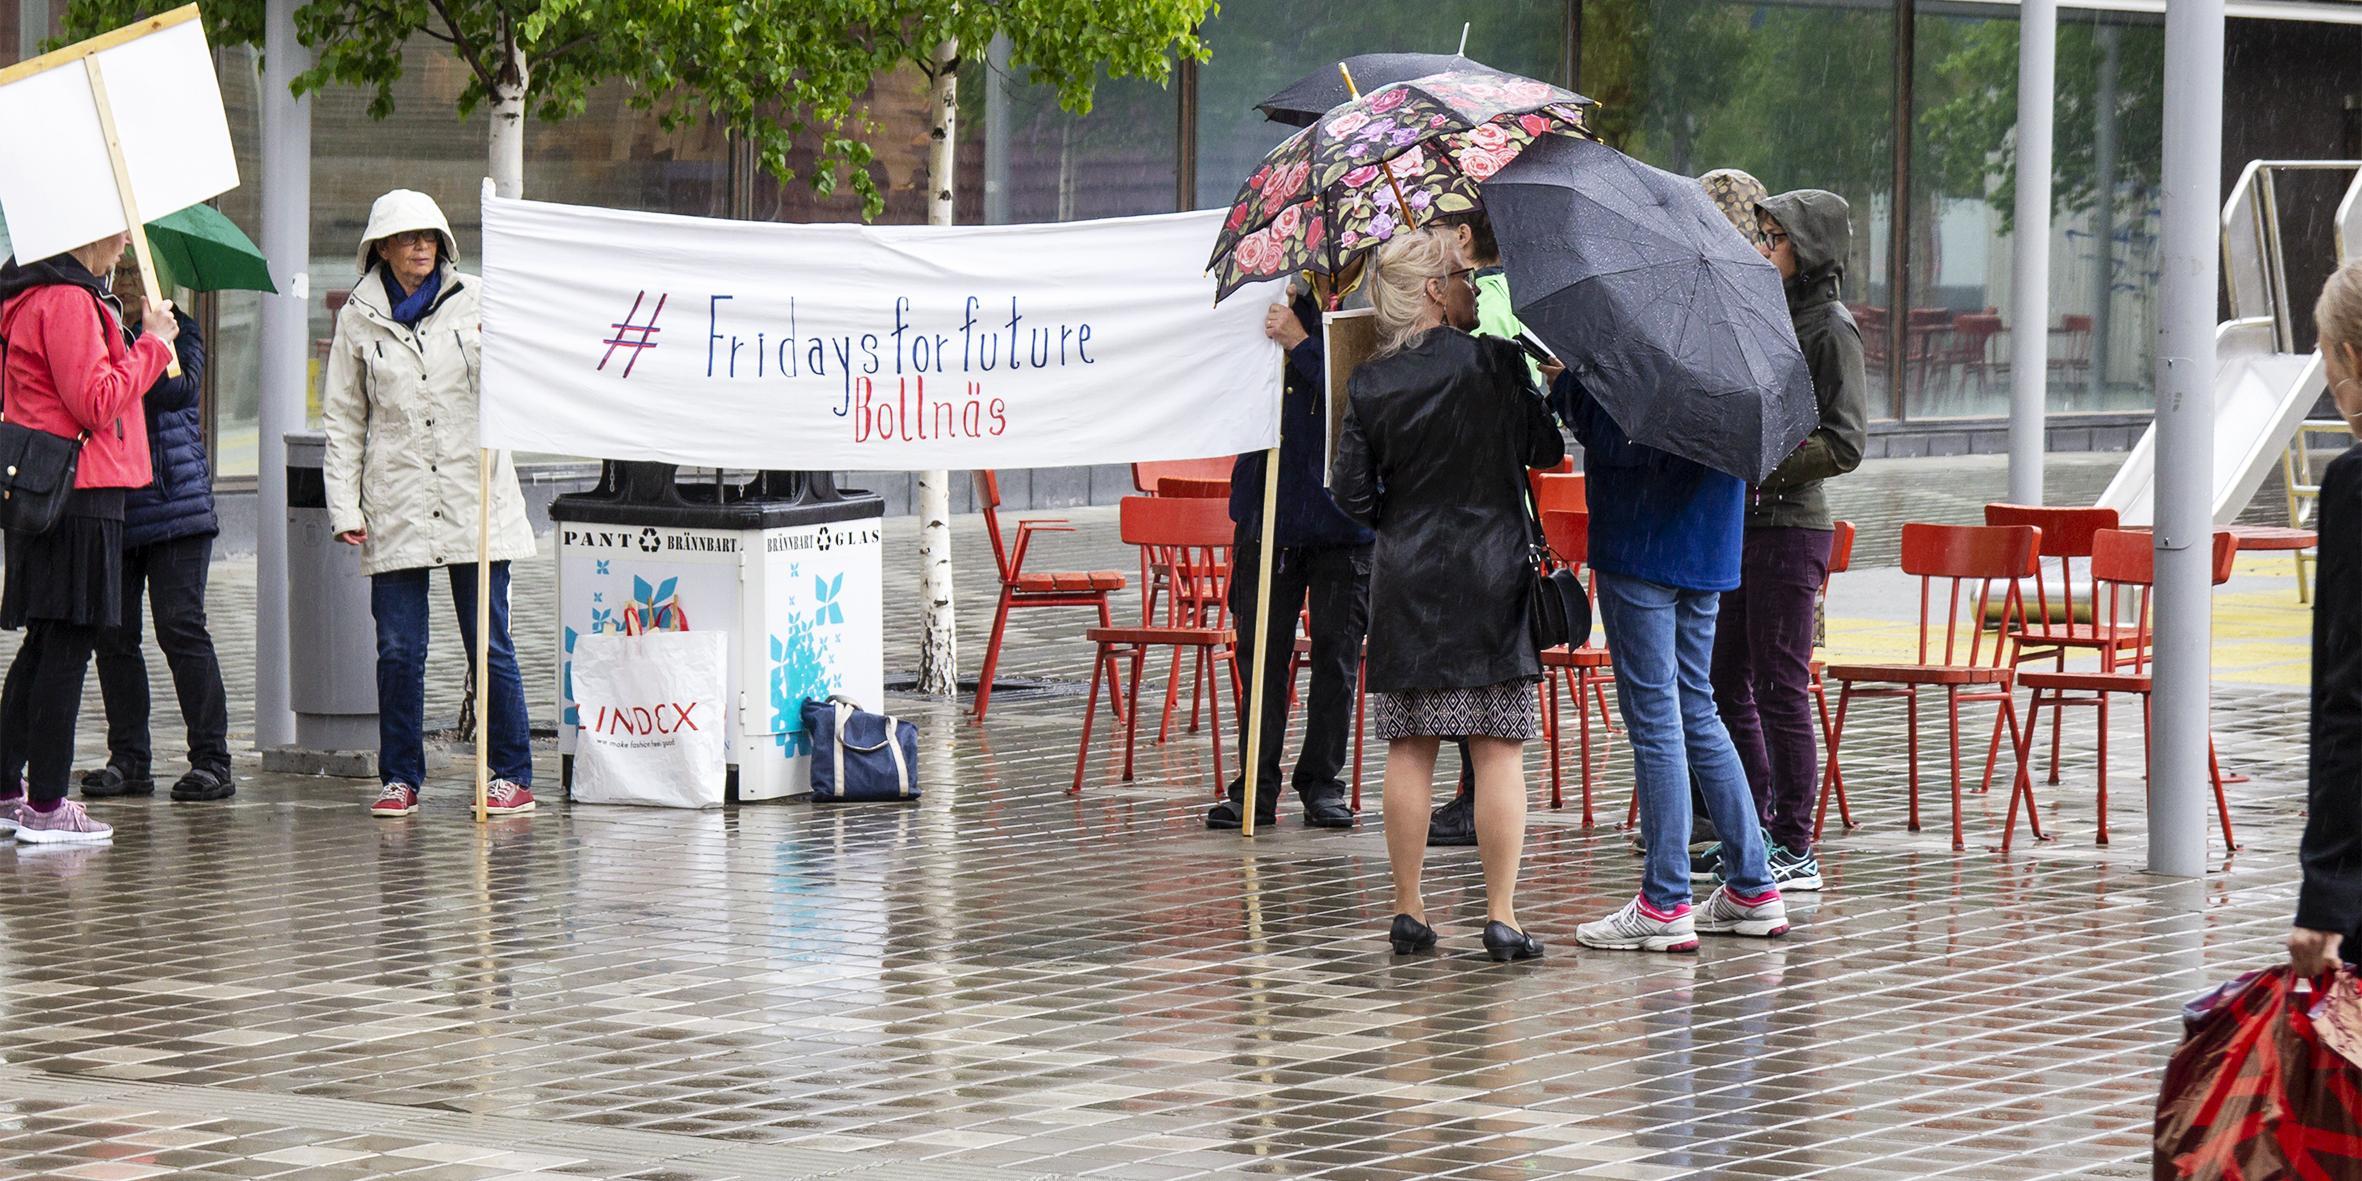 Trotsade regnet – manifestation med extra grönt inslag: